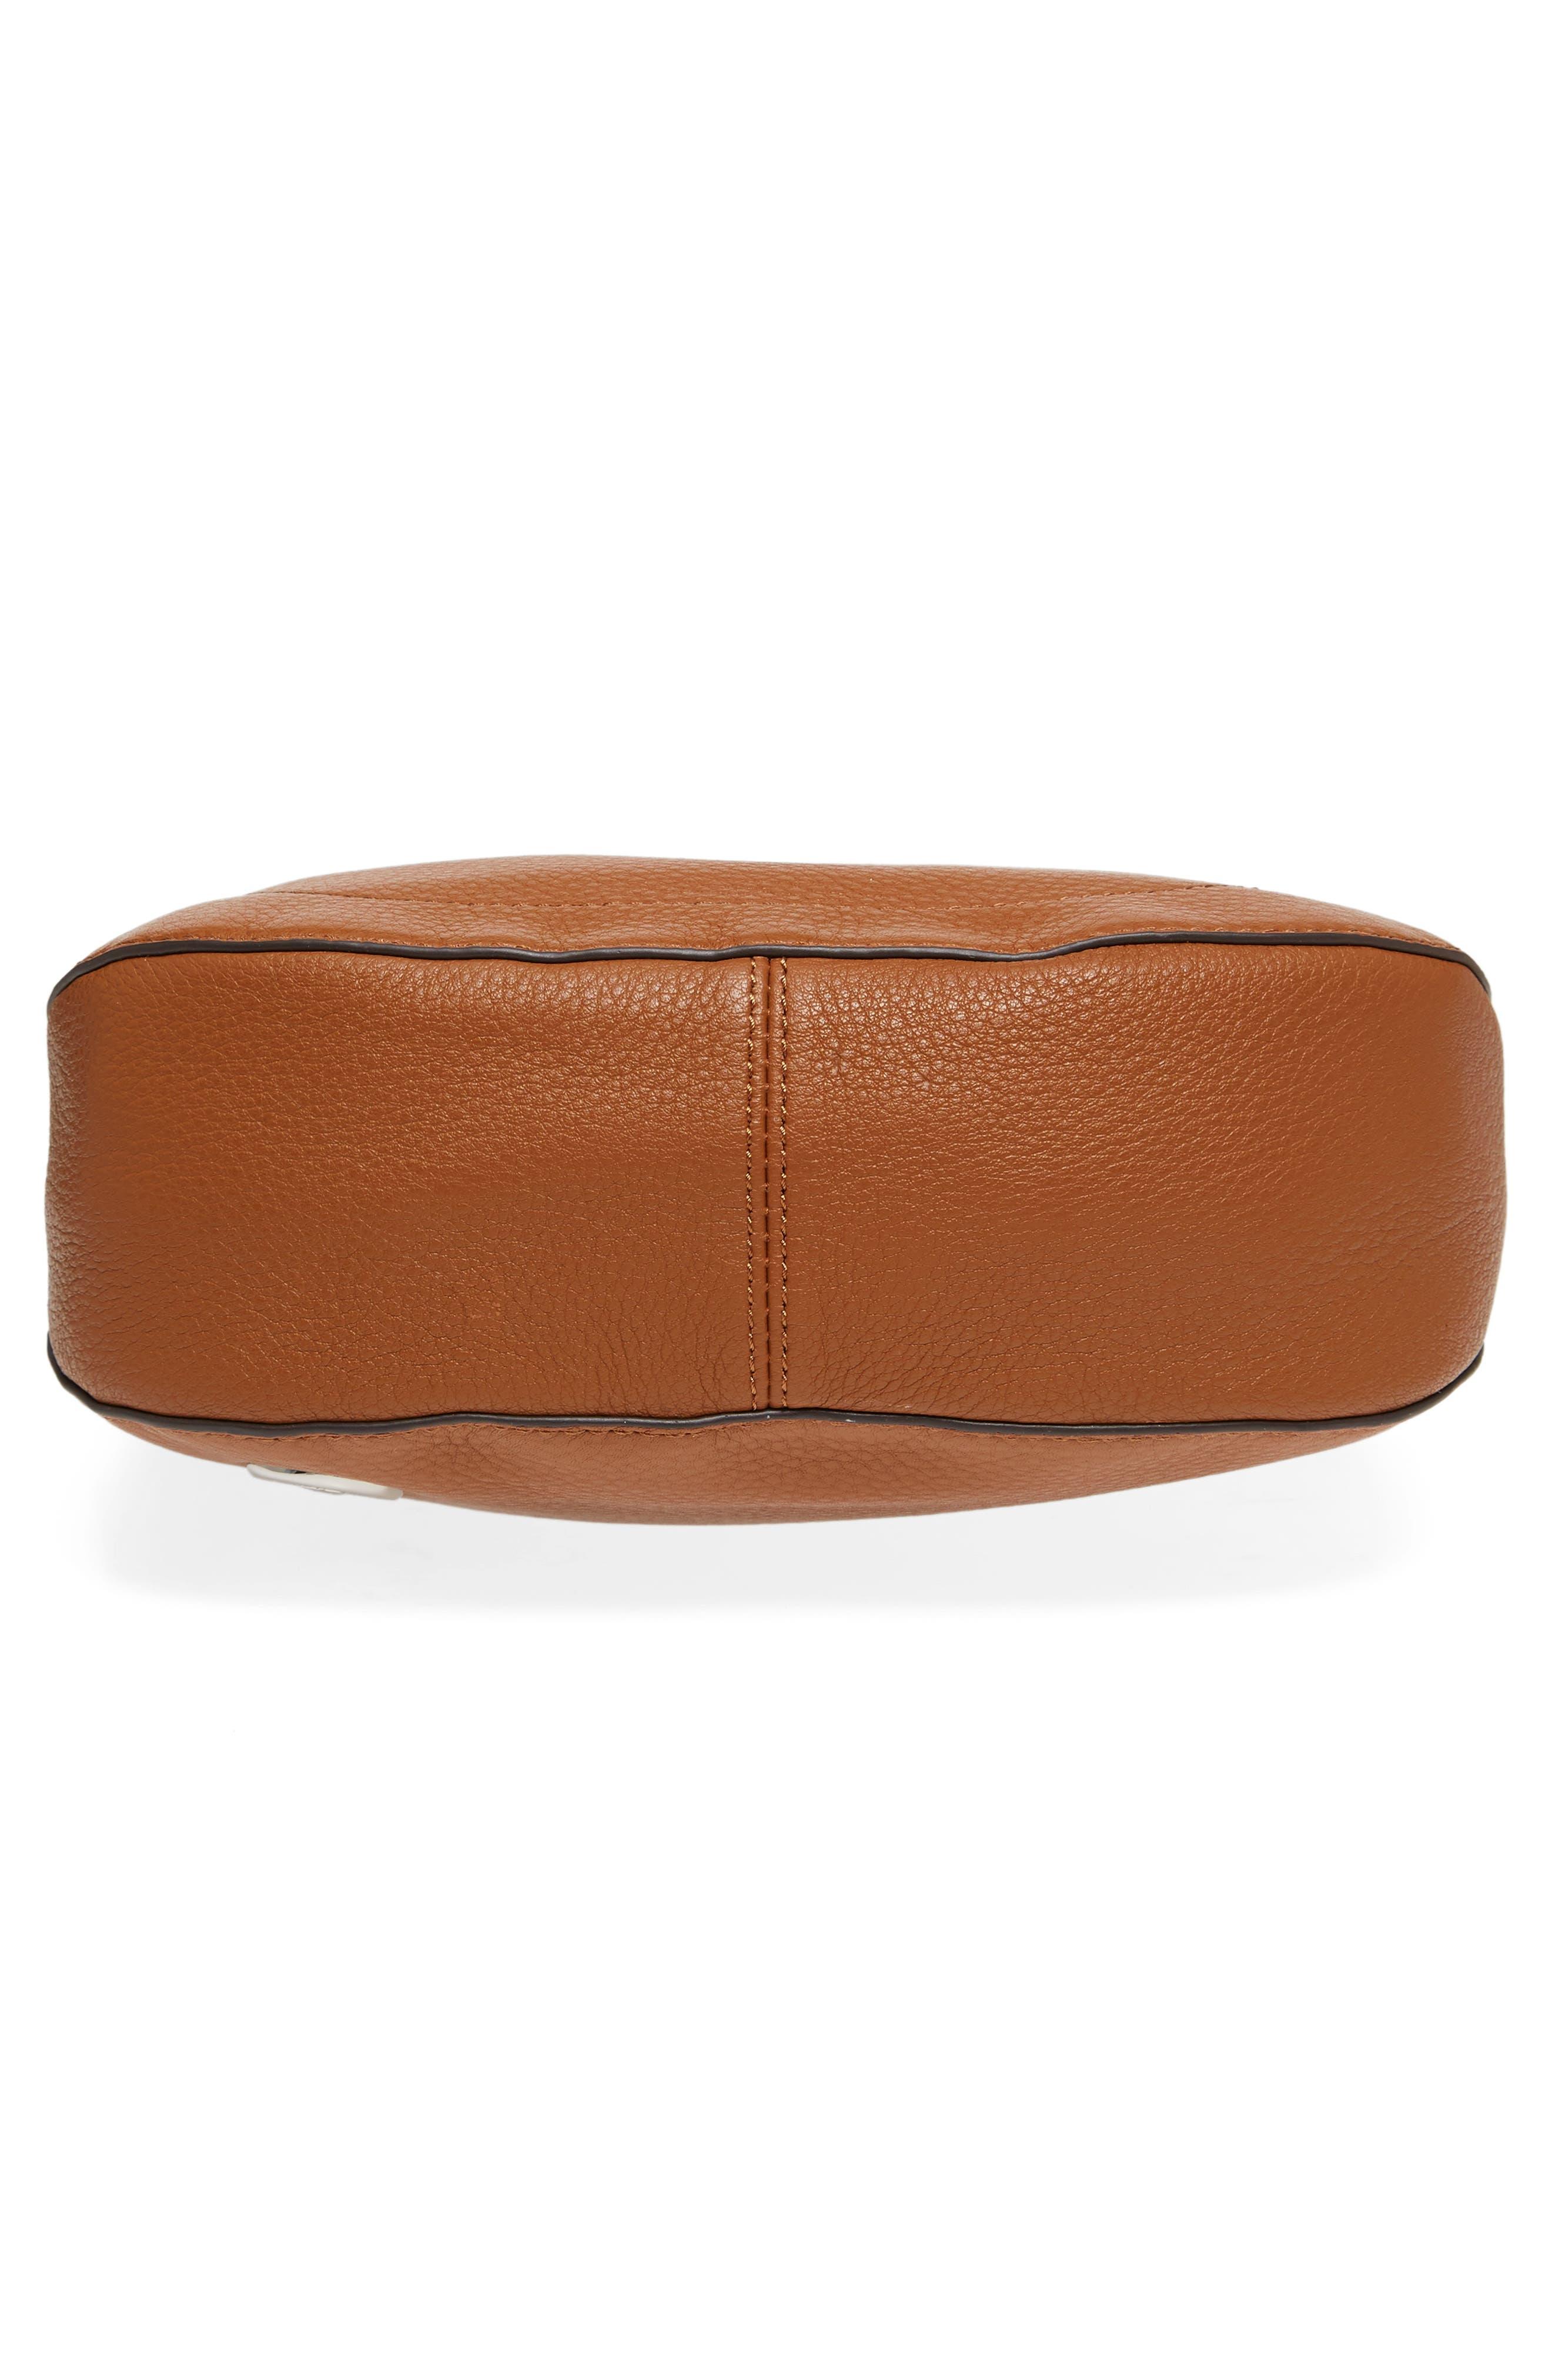 'Tala' Leather Crossbody Bag,                             Alternate thumbnail 7, color,                             Dark Rum